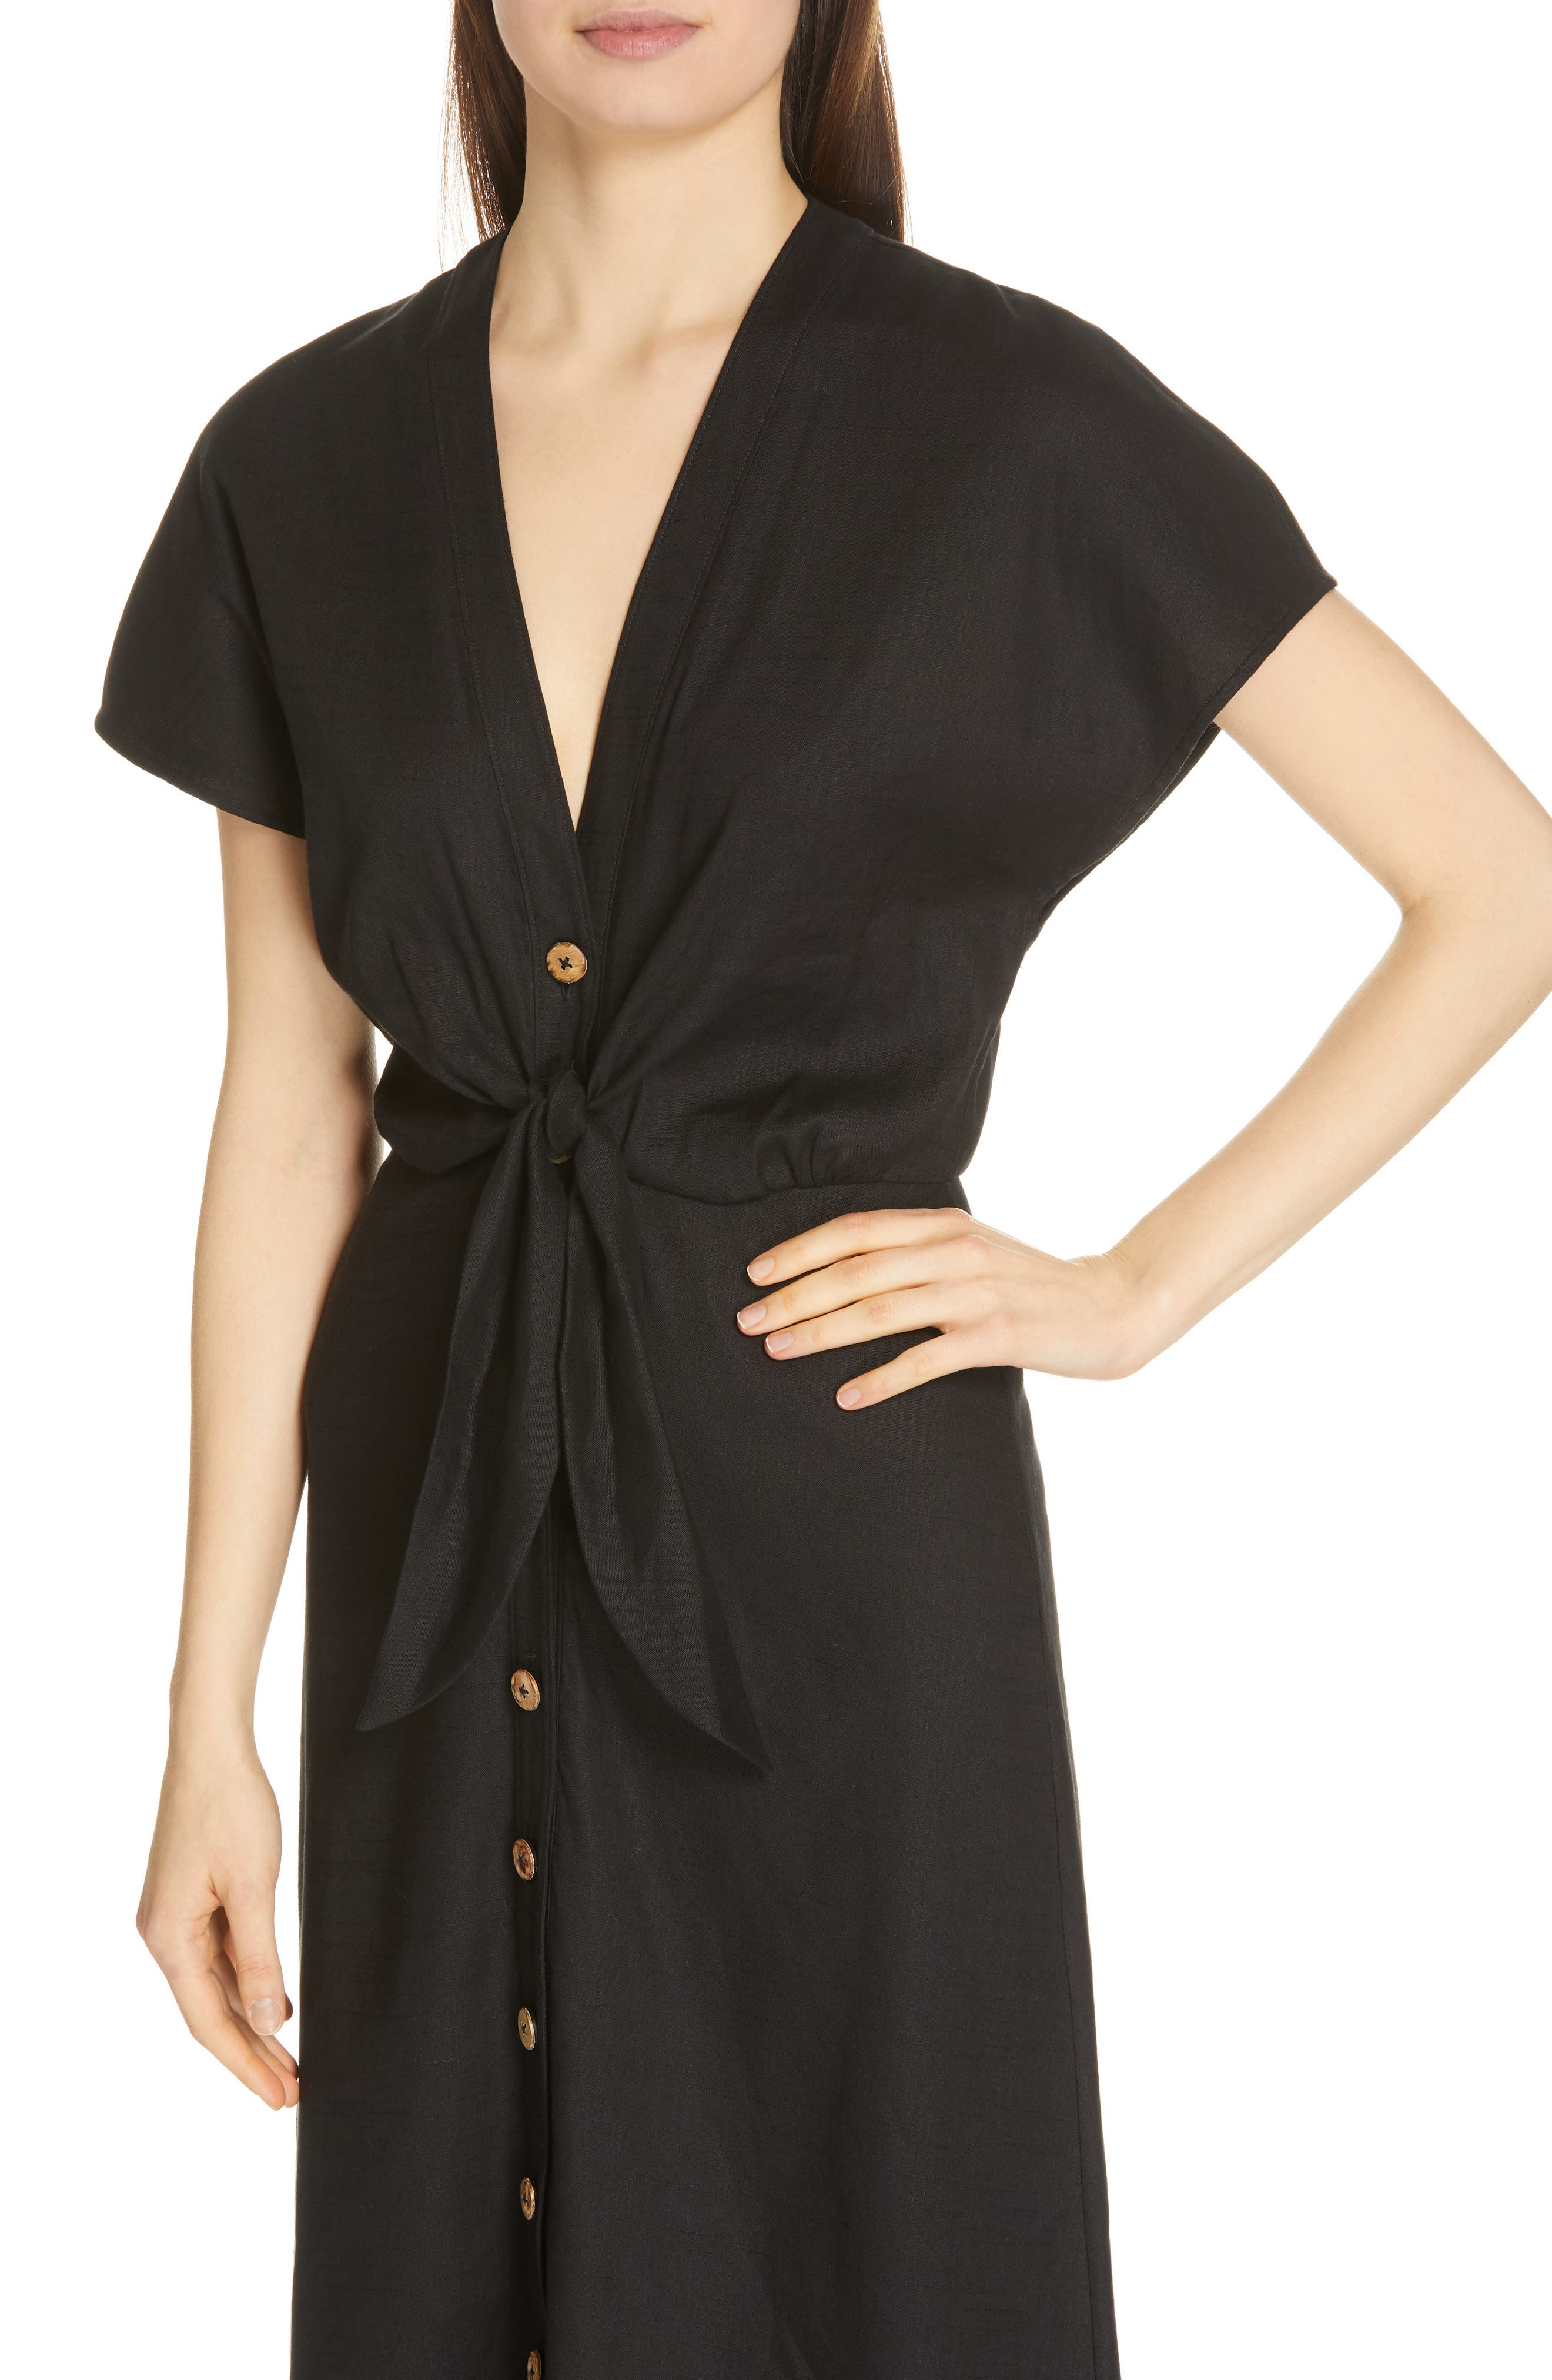 VERONICA BEARD, Giana Tie Waist Linen Blend Midi Dress, Alternate thumbnail 5, color, BLACK